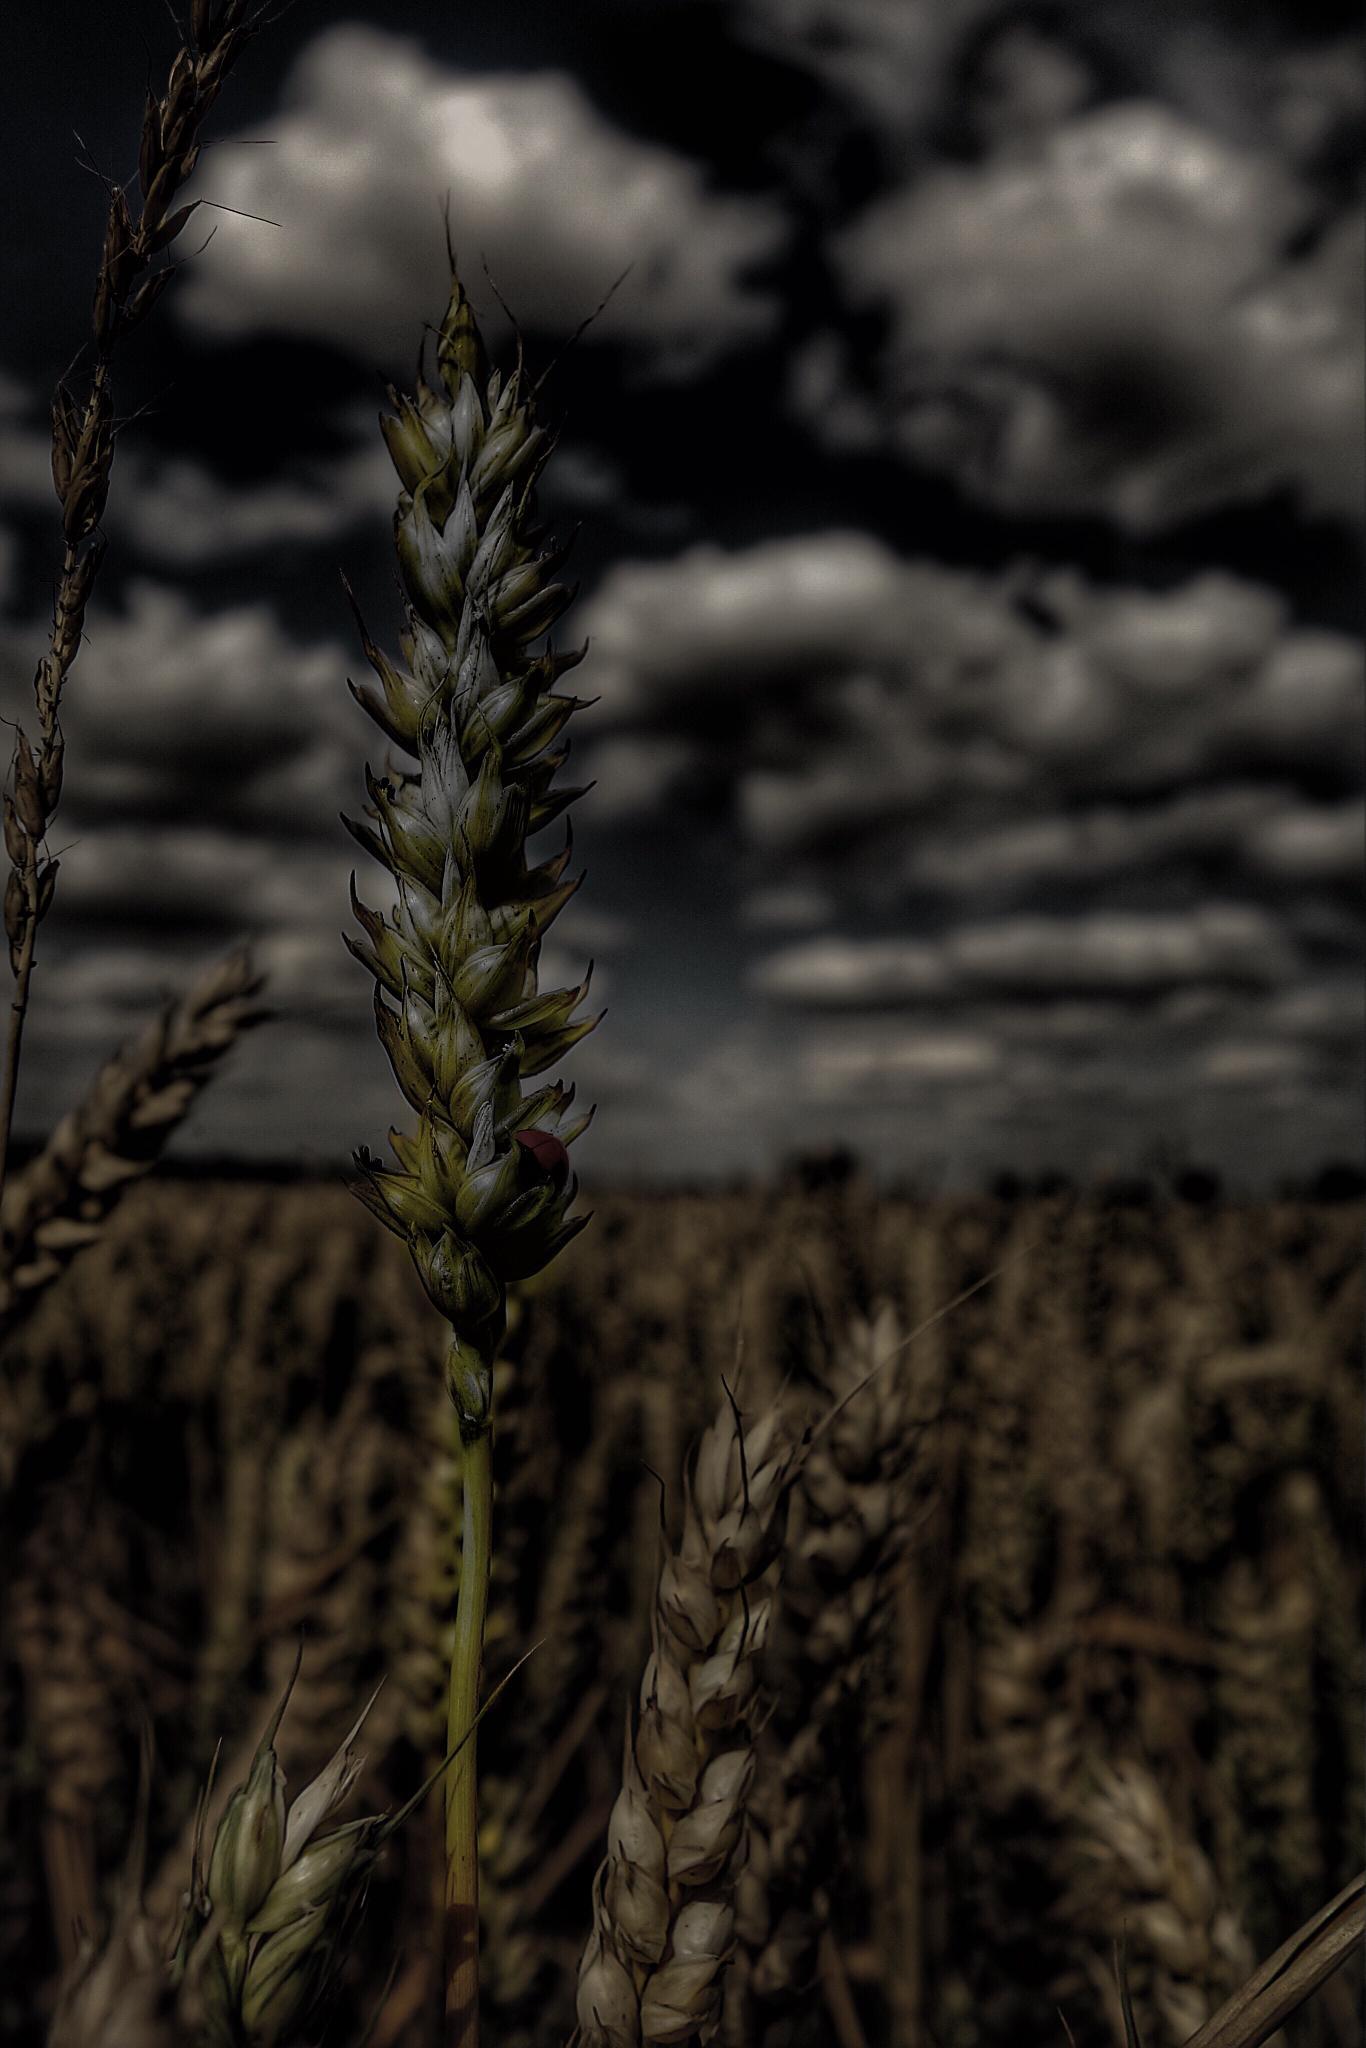 Storm on the way by Paul Agnoli